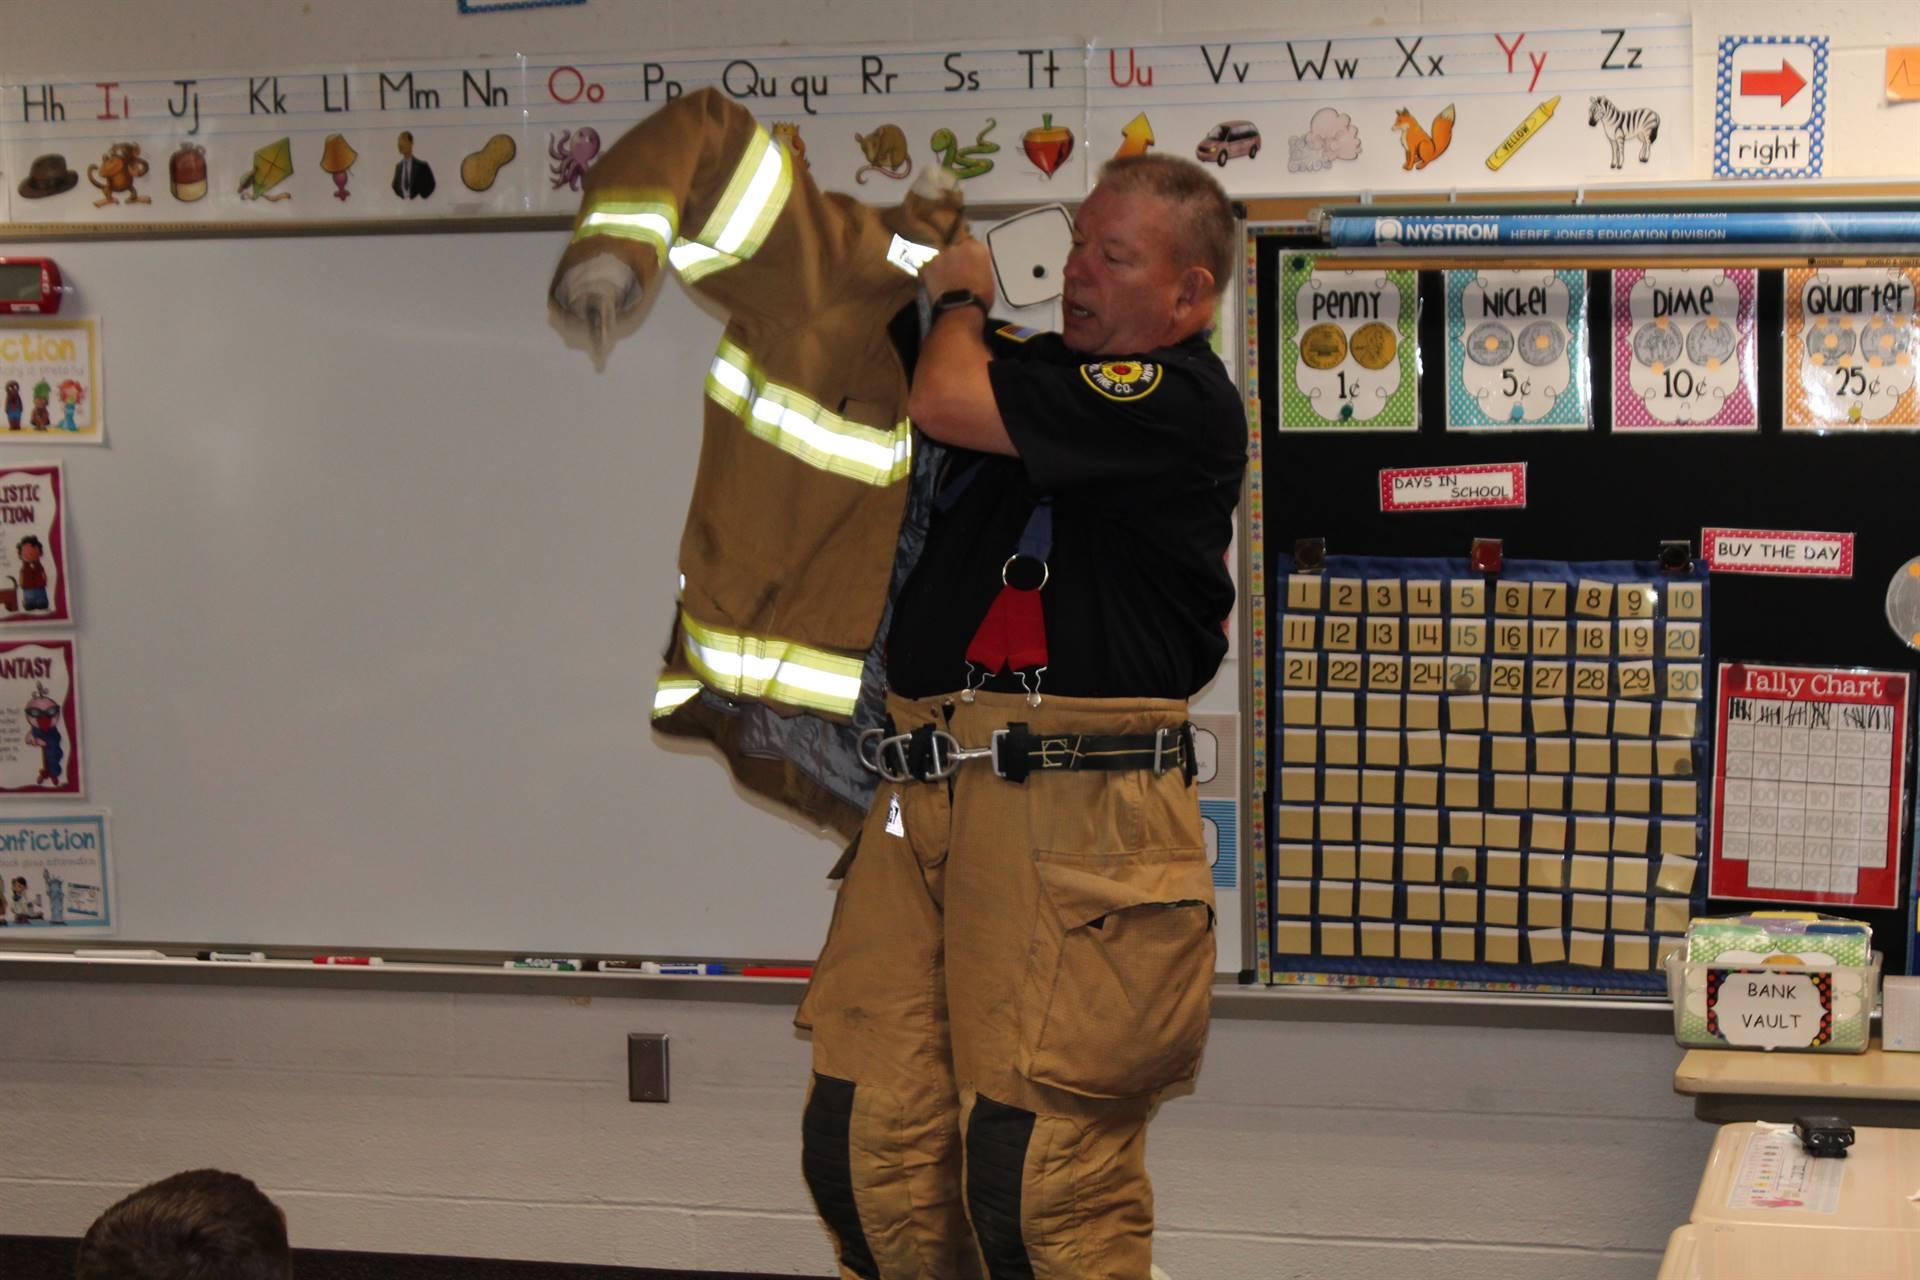 Fireman putting on his coat